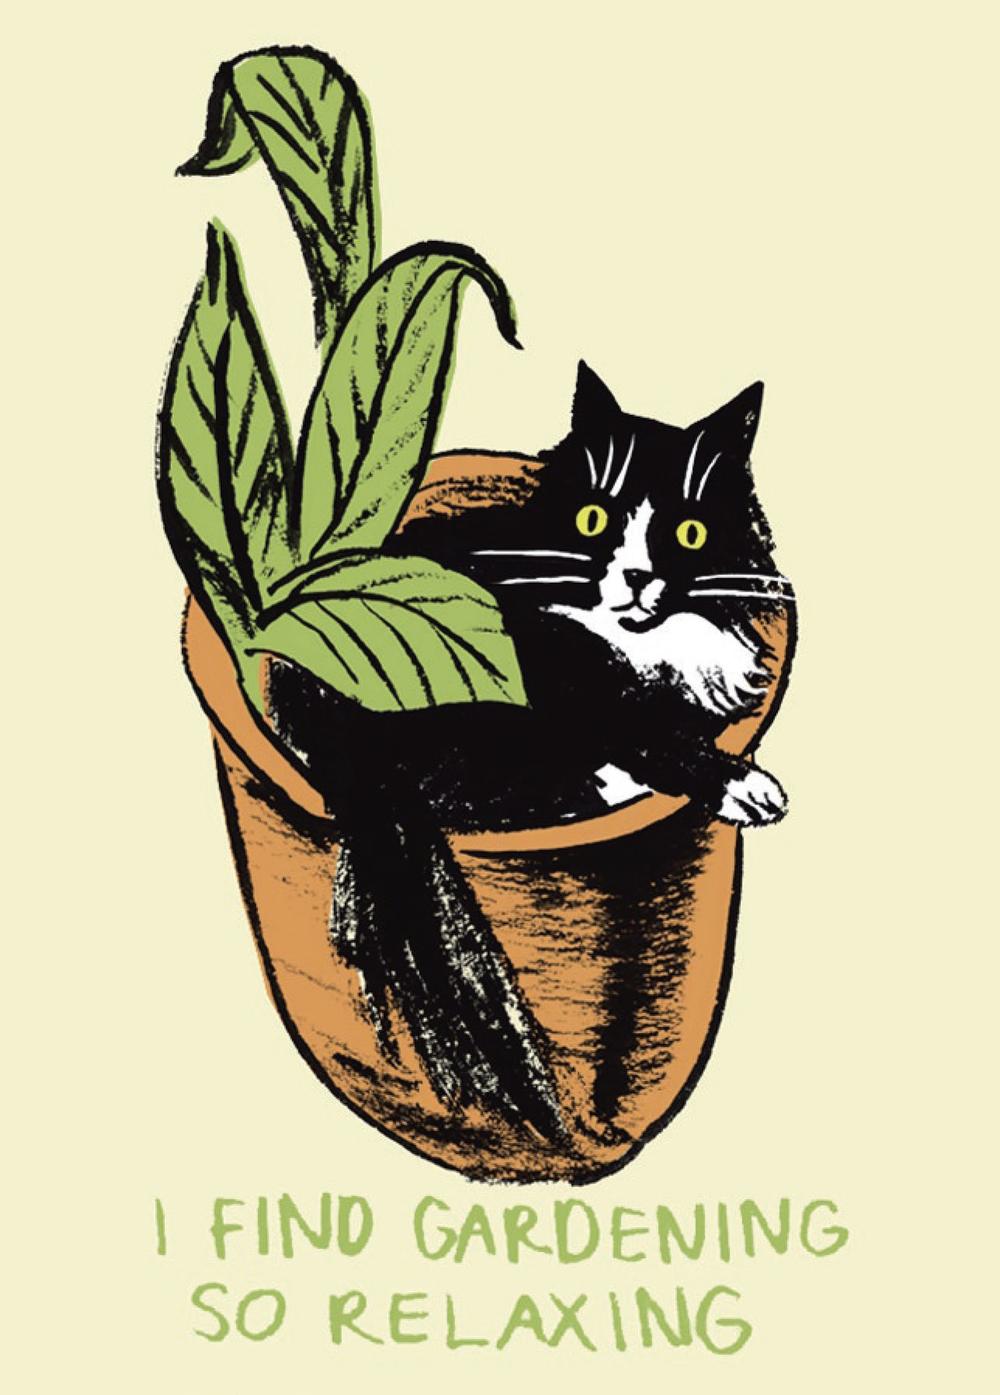 gardening-shorty.jpg